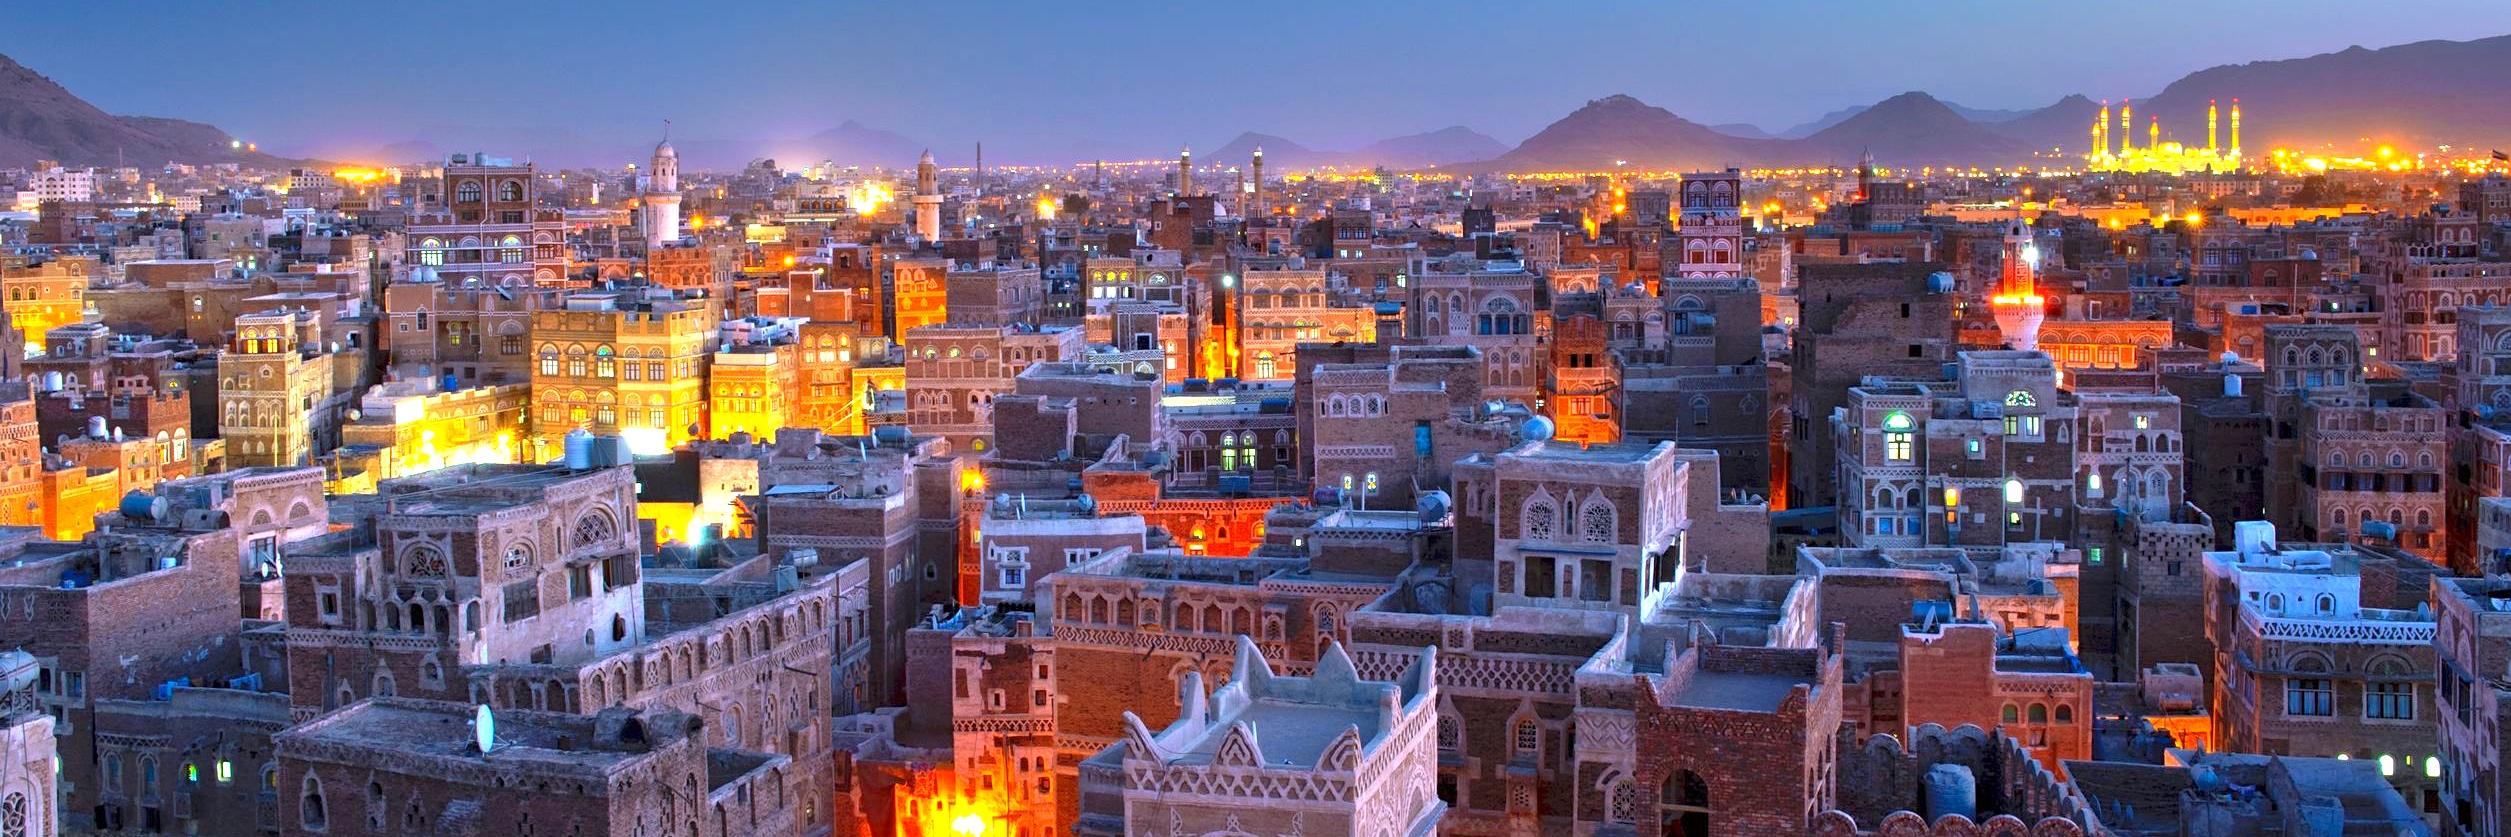 tax in yemen , business advisory in yemen ,yemen busines consulting , tax , audit , financial statment audit , IT services in yemen, ERP CRM